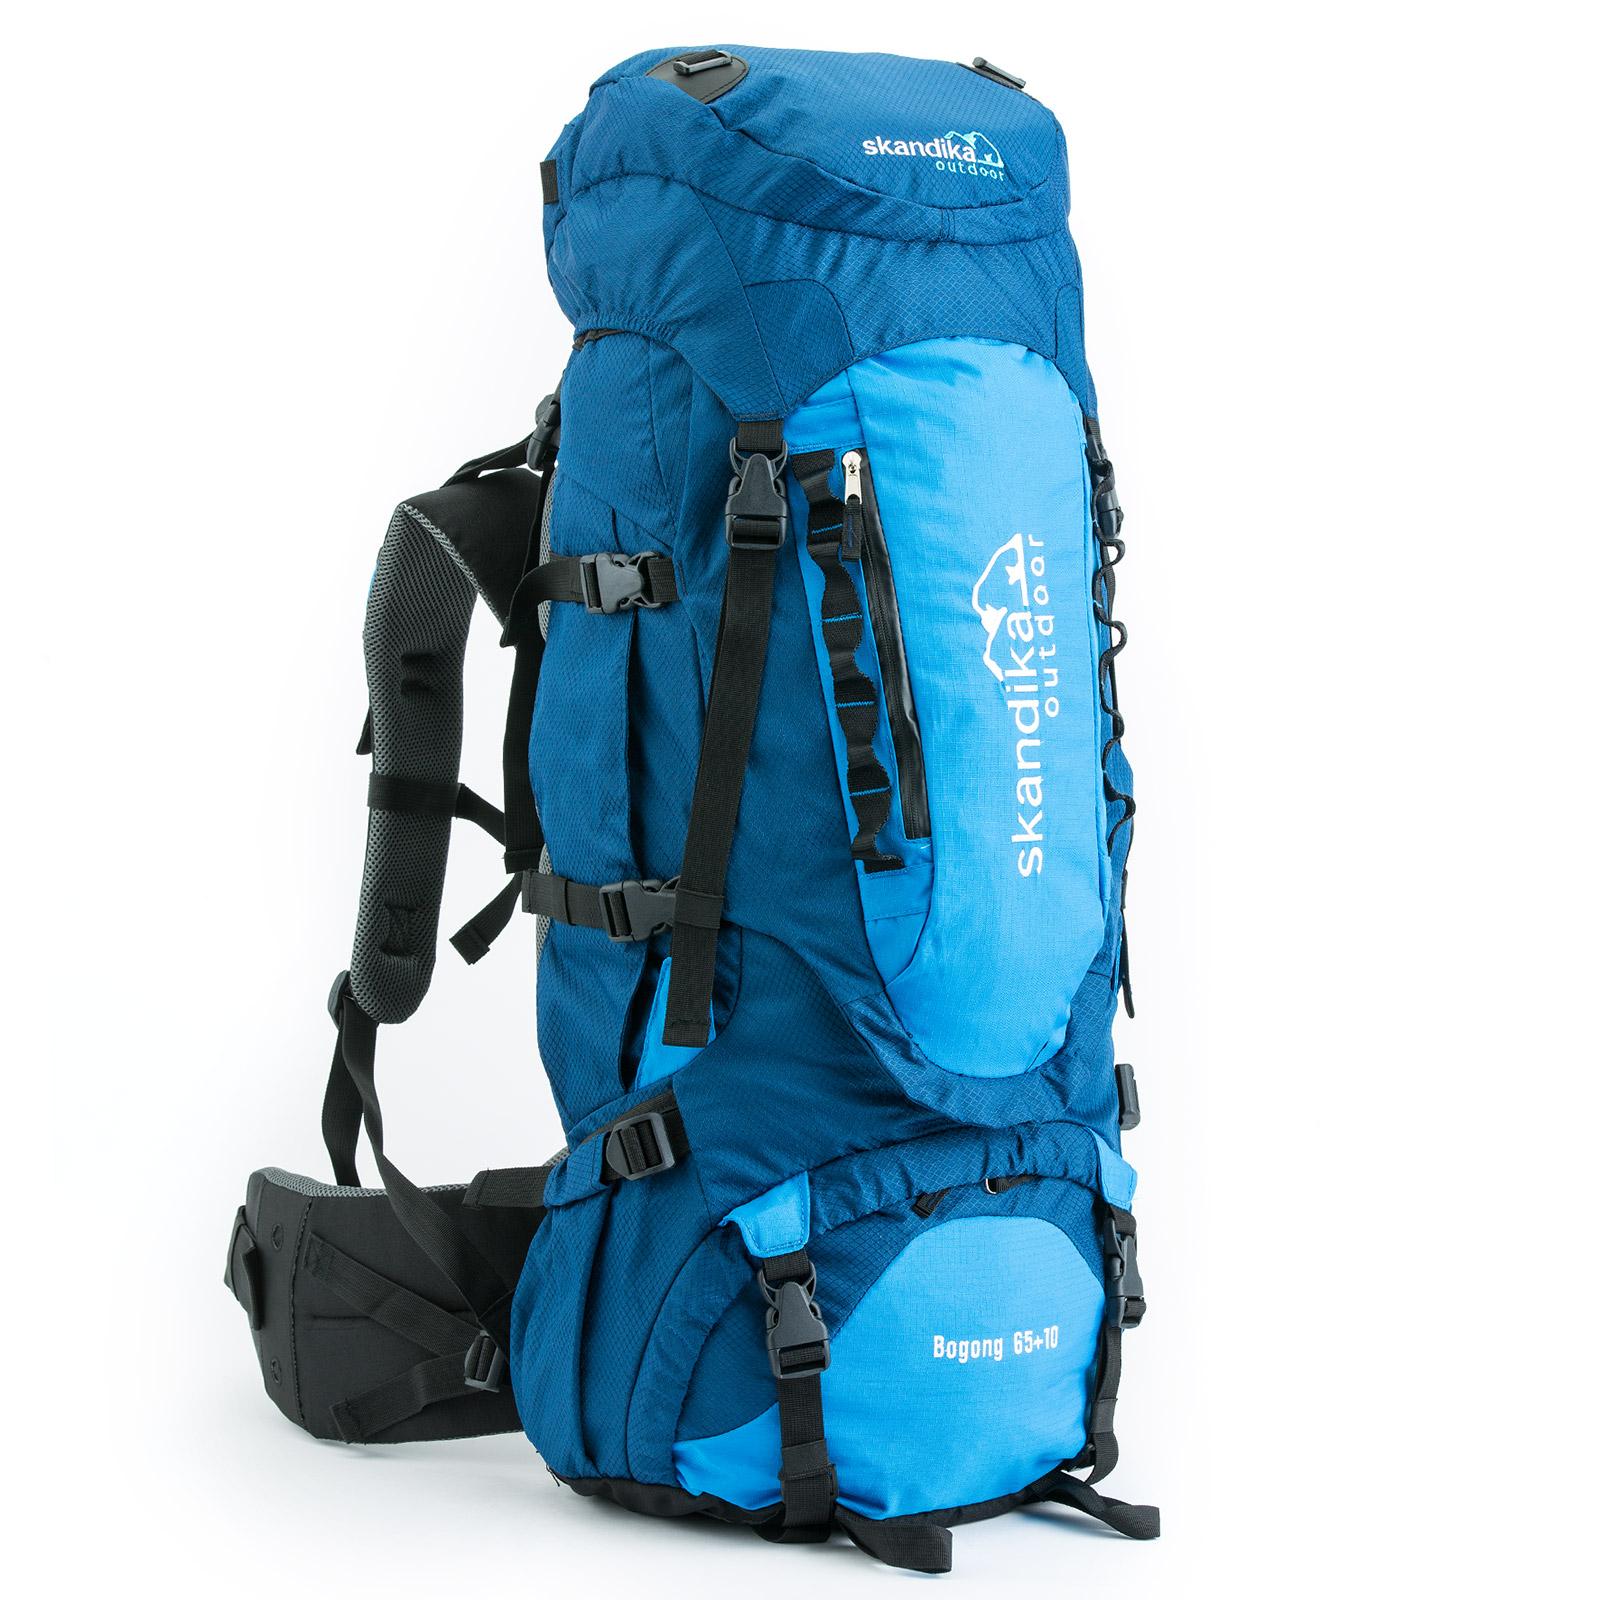 skandika trekking rucksack sporttasche freizeitrucksack. Black Bedroom Furniture Sets. Home Design Ideas